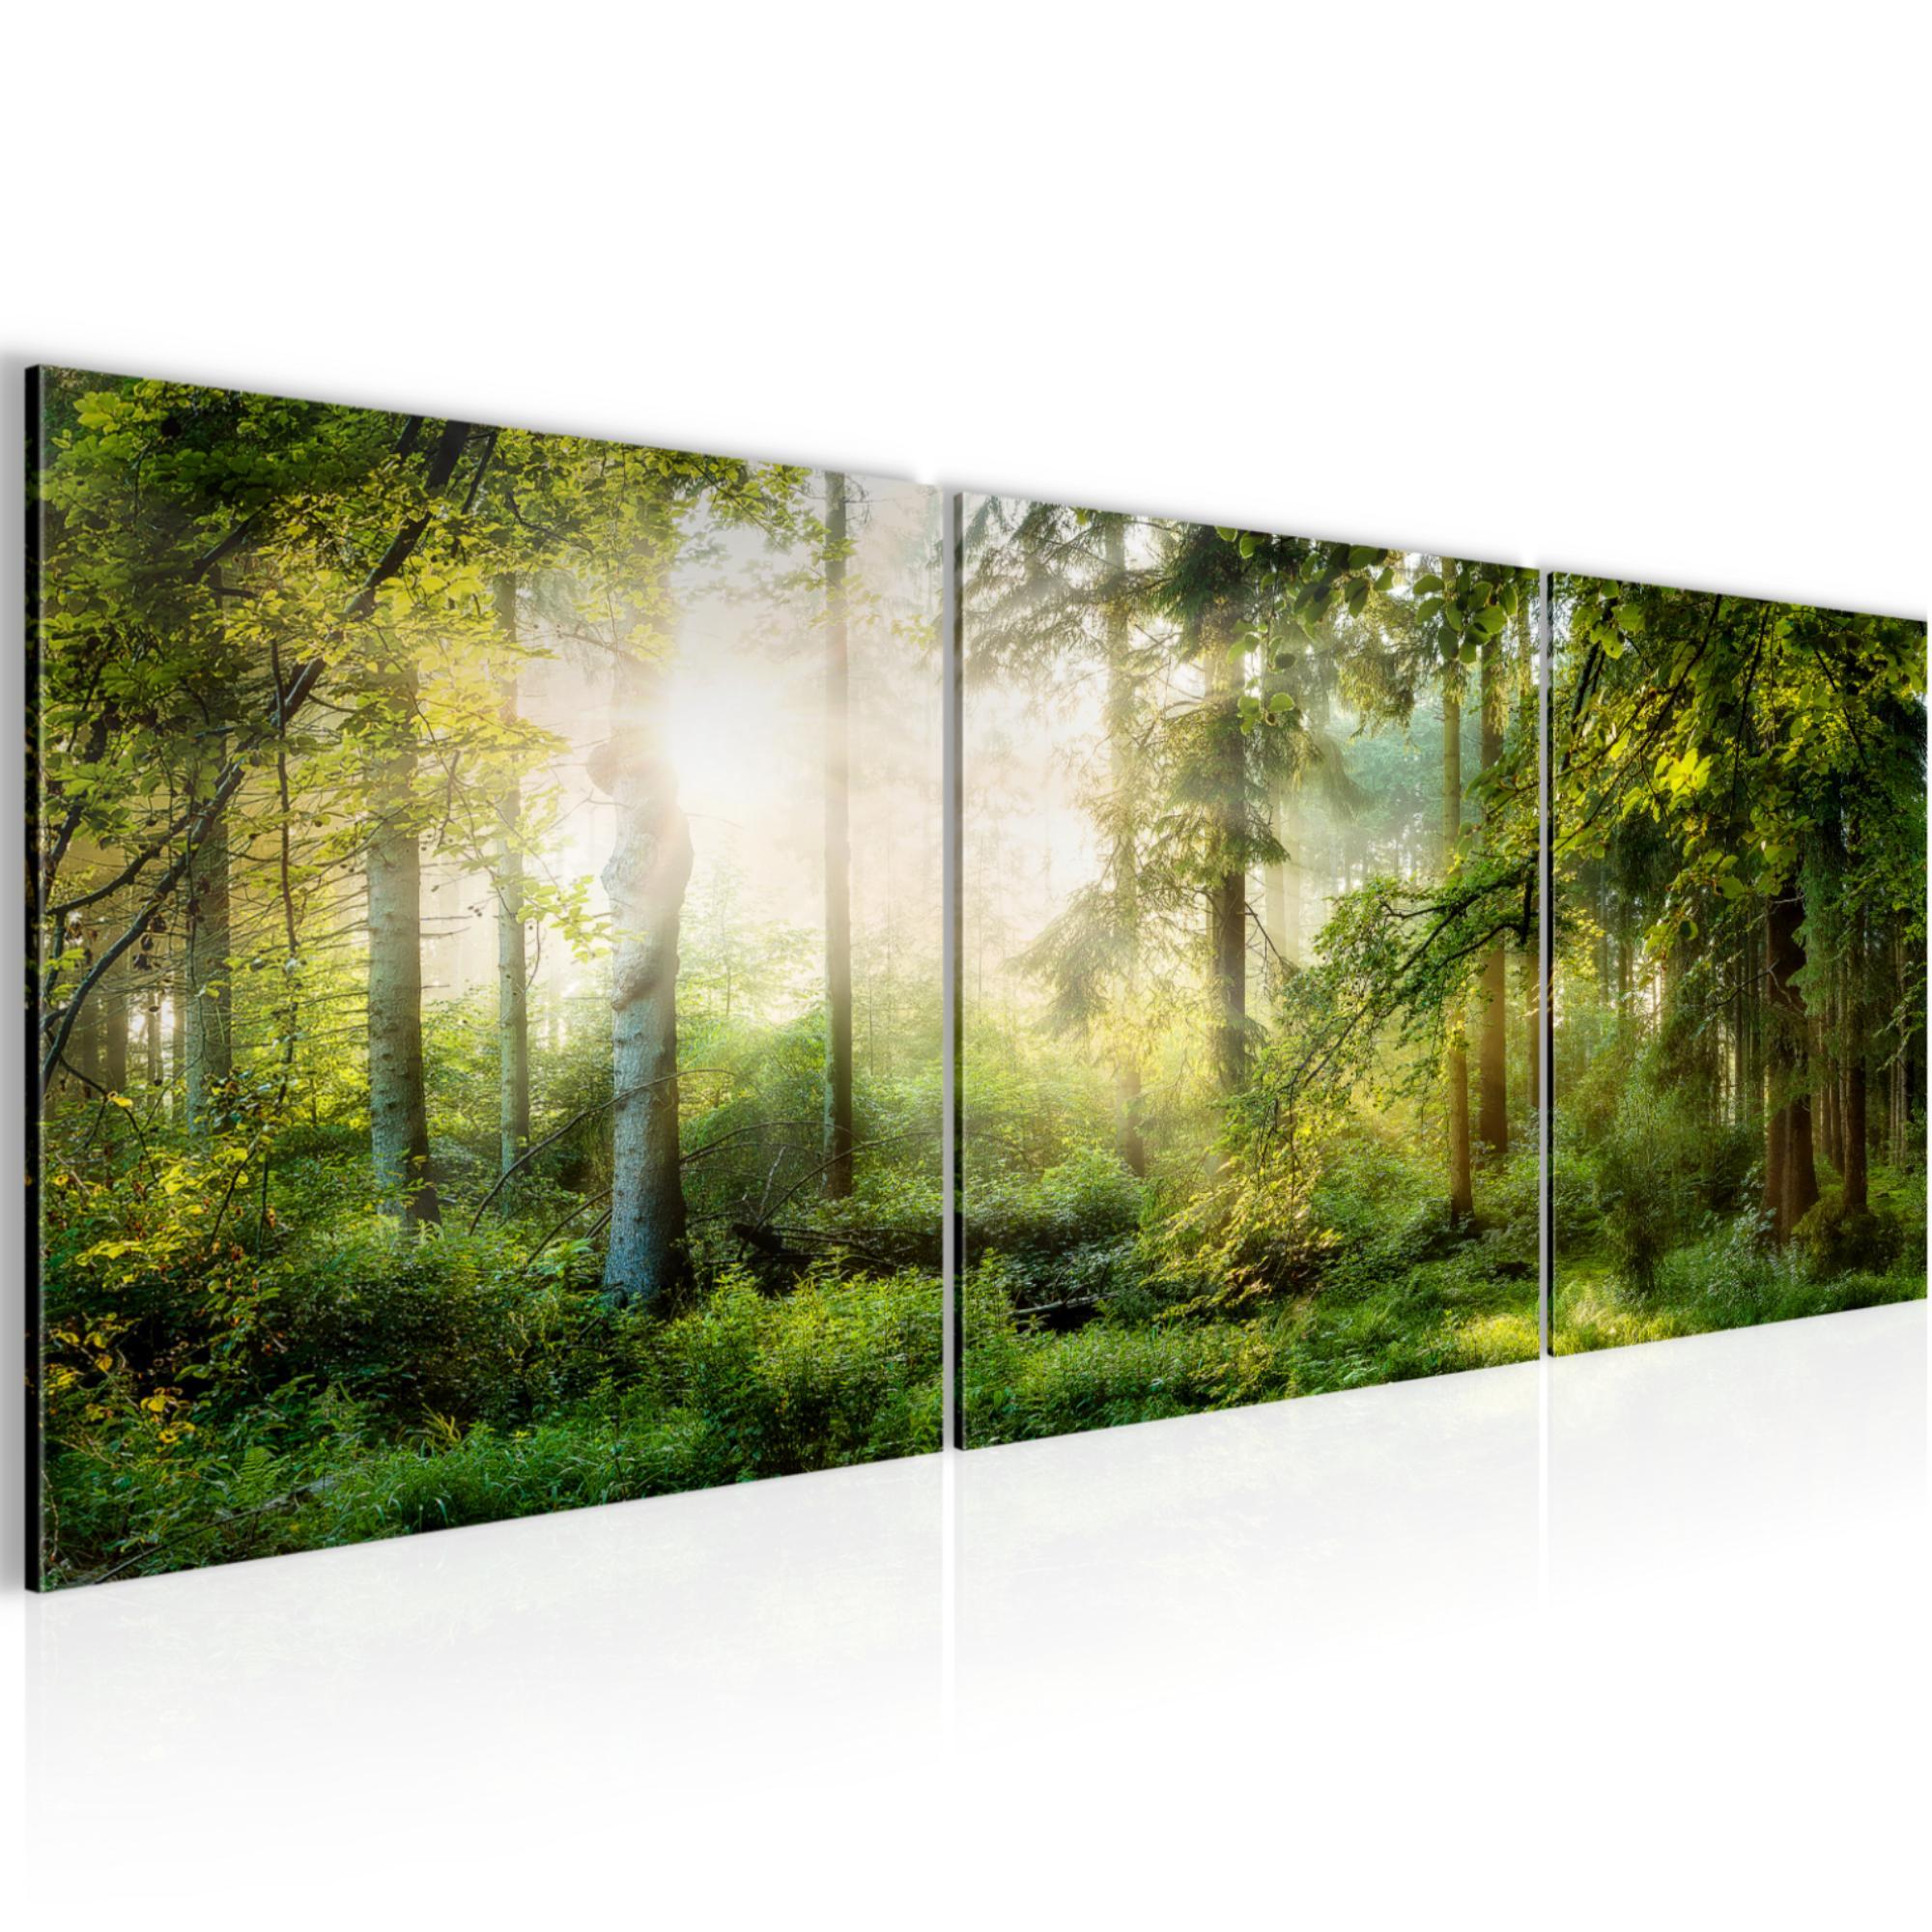 Bild Bilder Wandbild XXL Kunstdruck Leinwand aus Vlies Wald Landschaft Deko